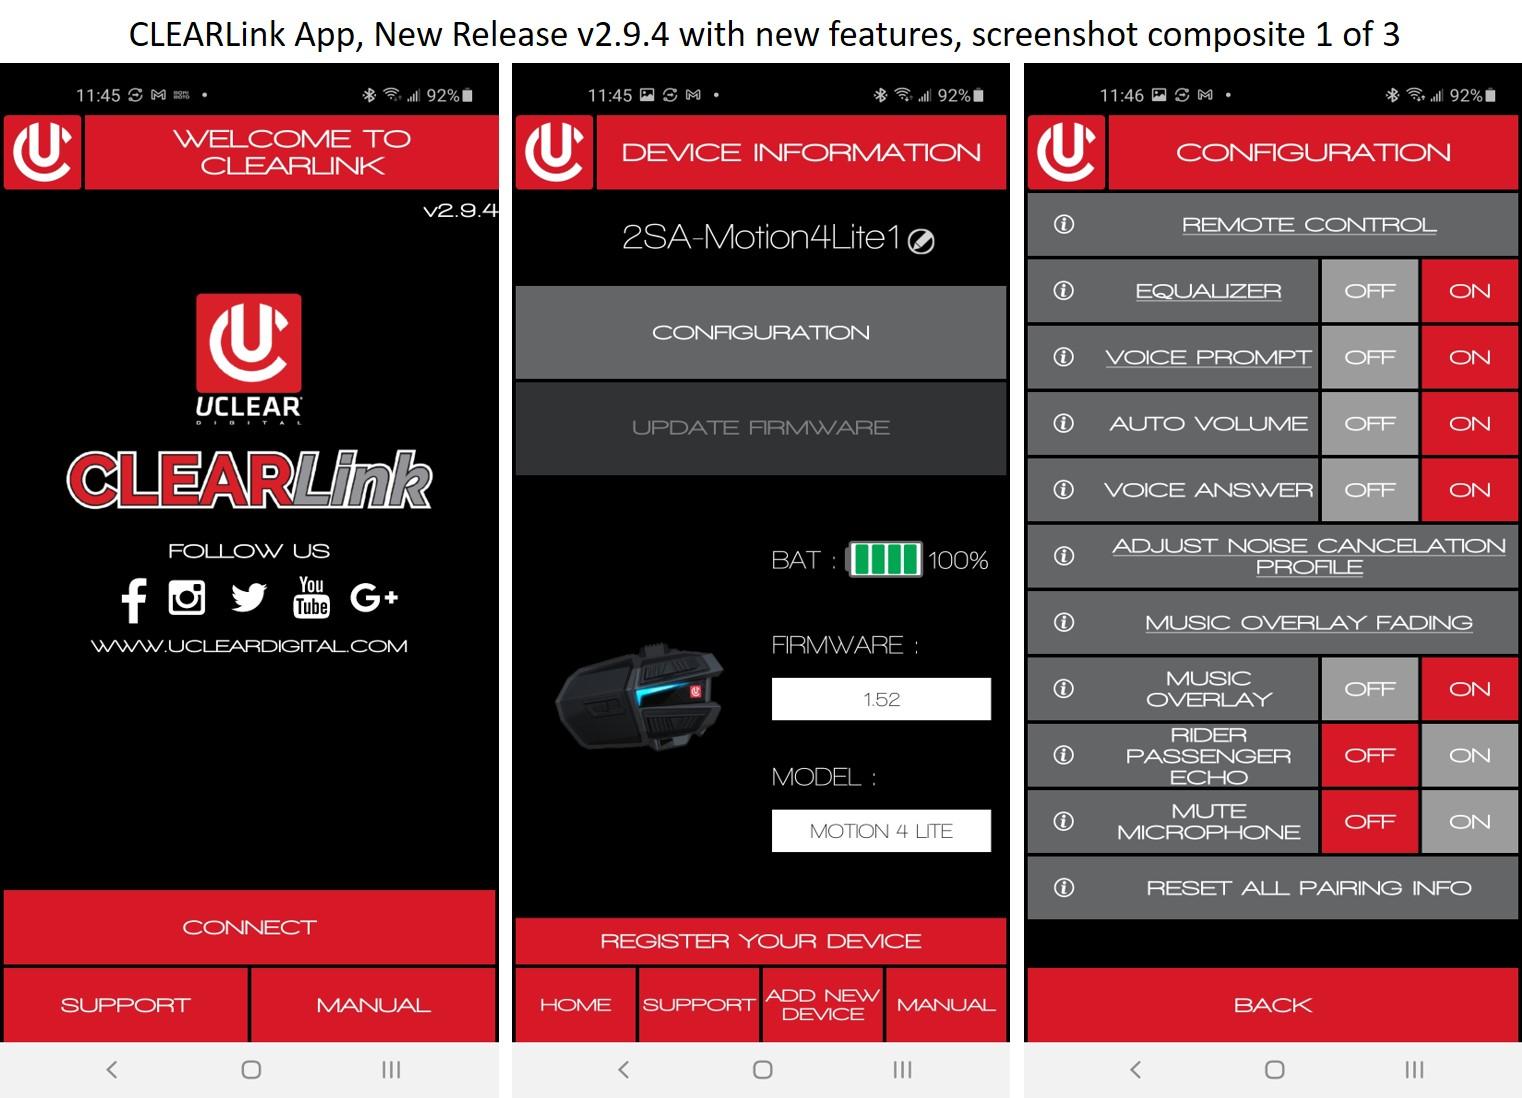 CLEARlink App software screens